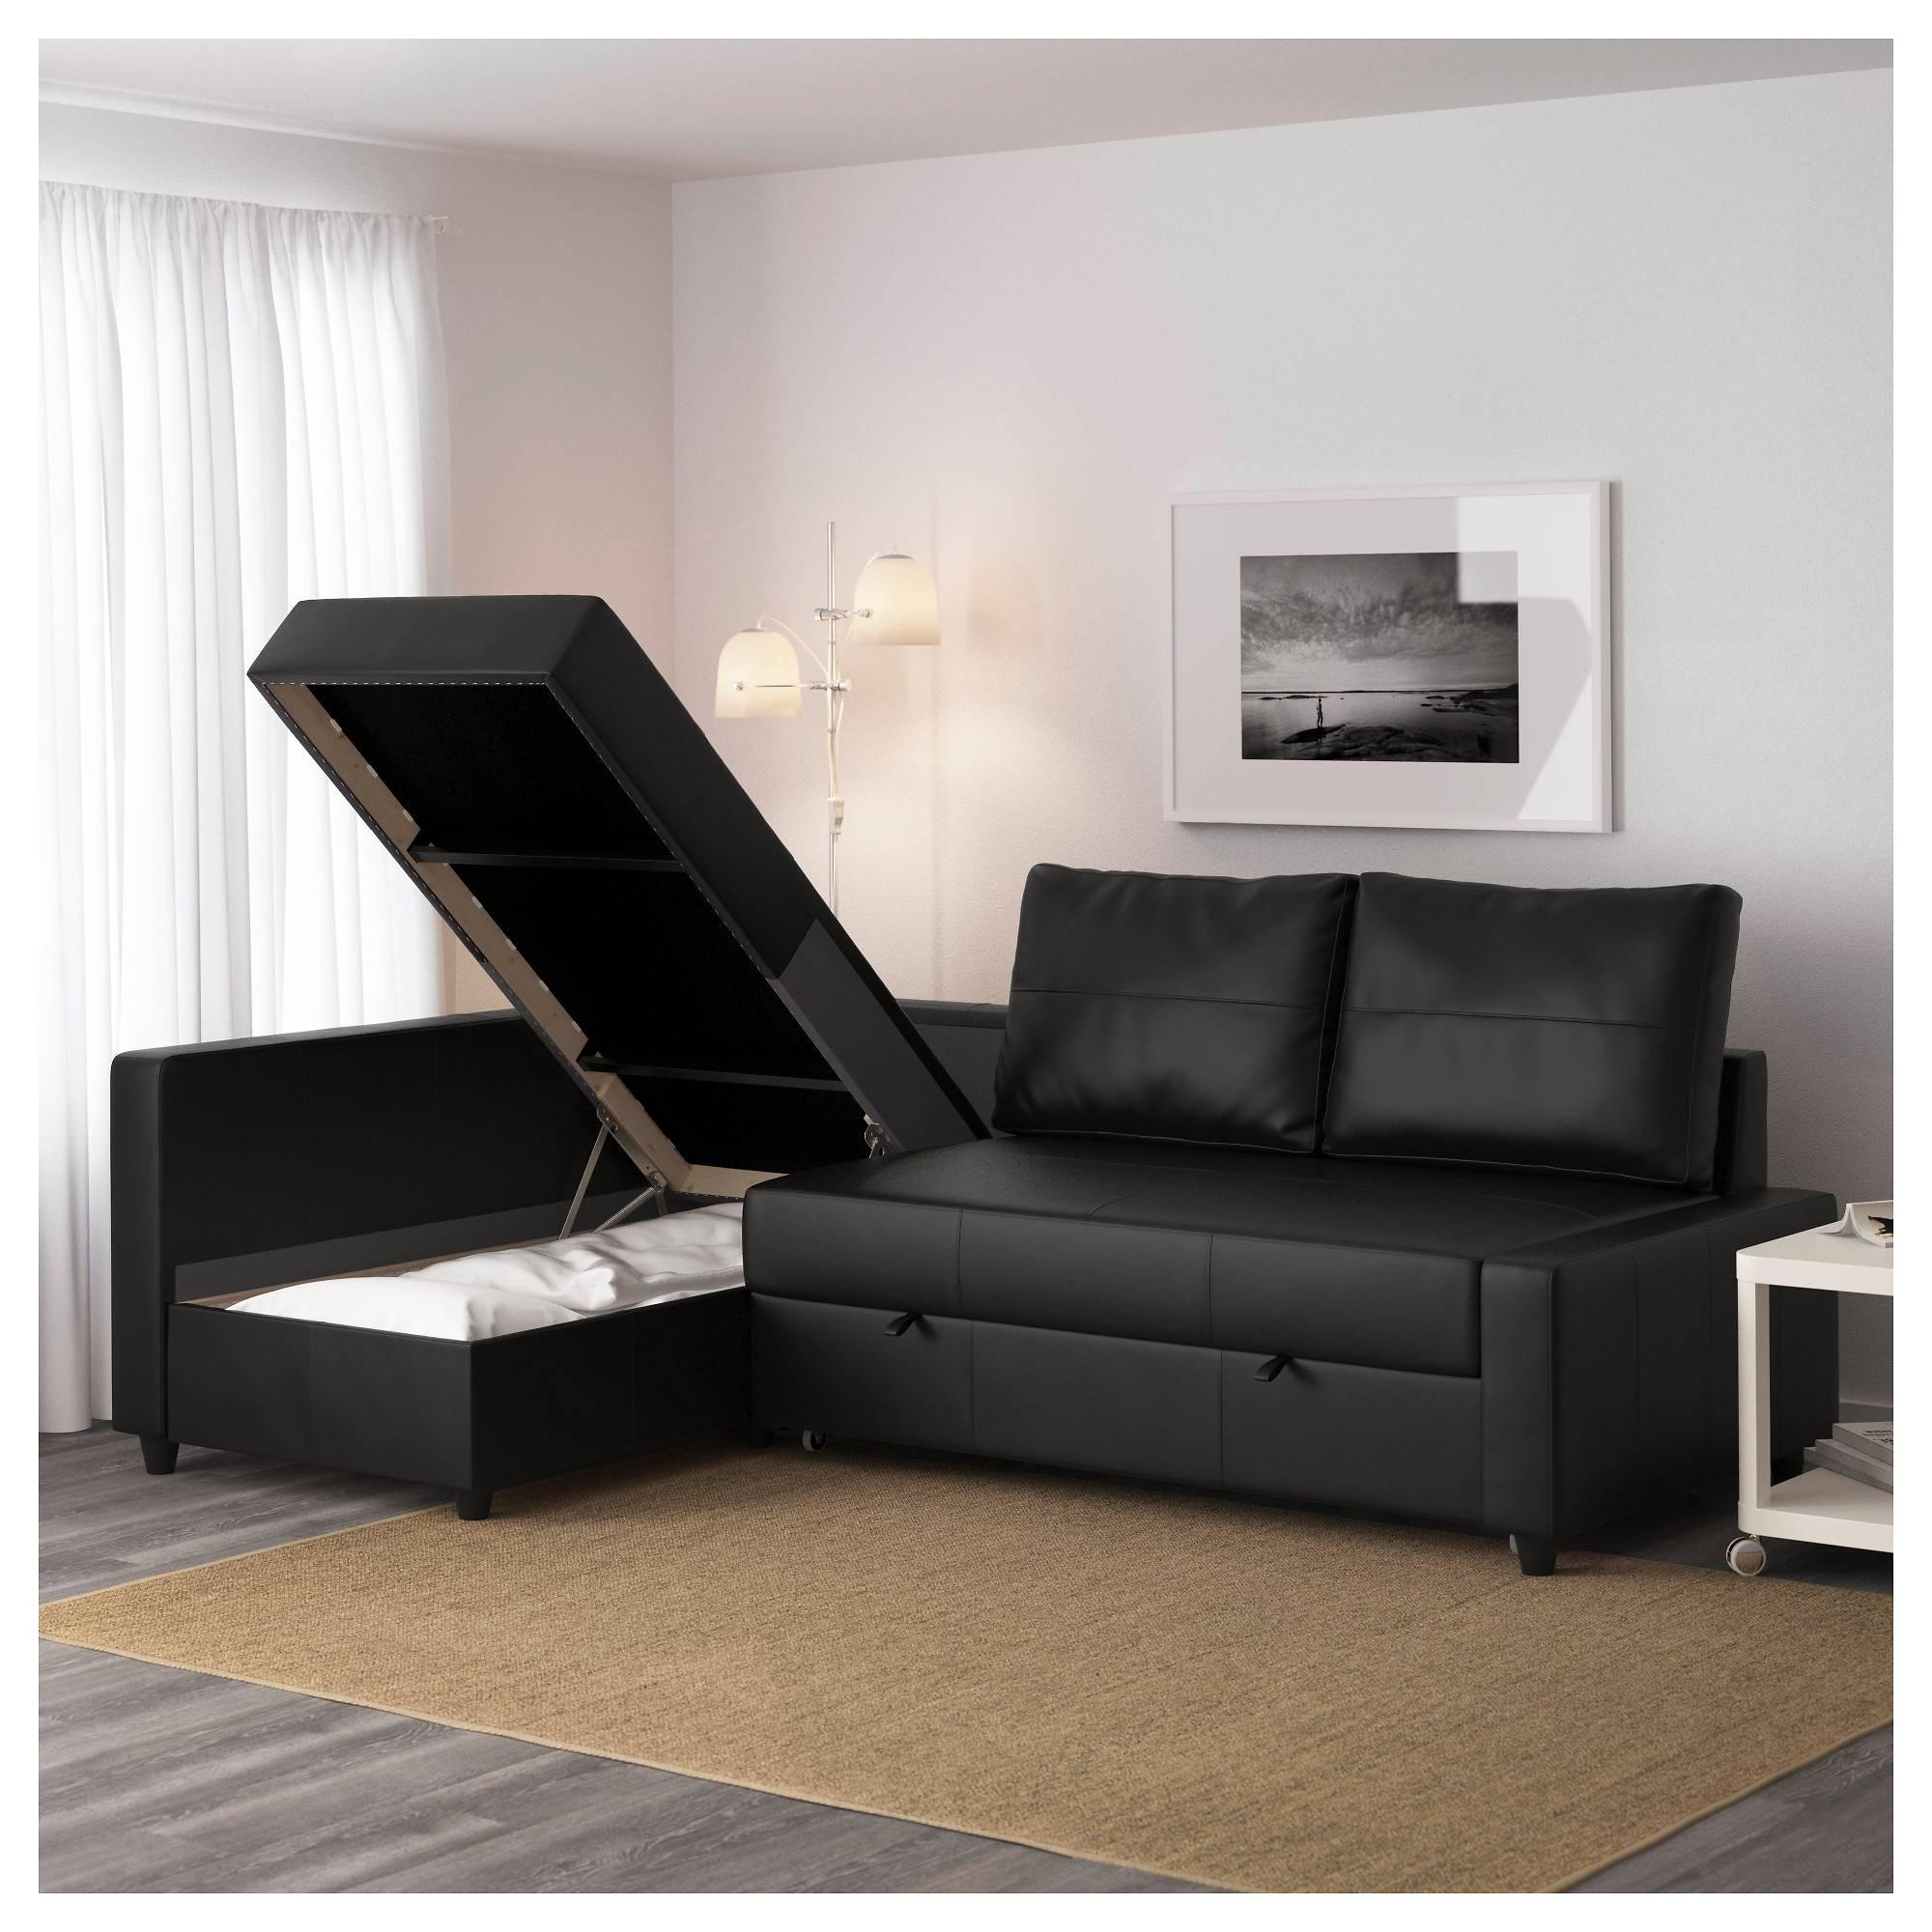 Friheten Sleeper Sectional,3 Seat W/storage - Skiftebo Dark Gray in Storage Sofa Ikea (Image 10 of 25)